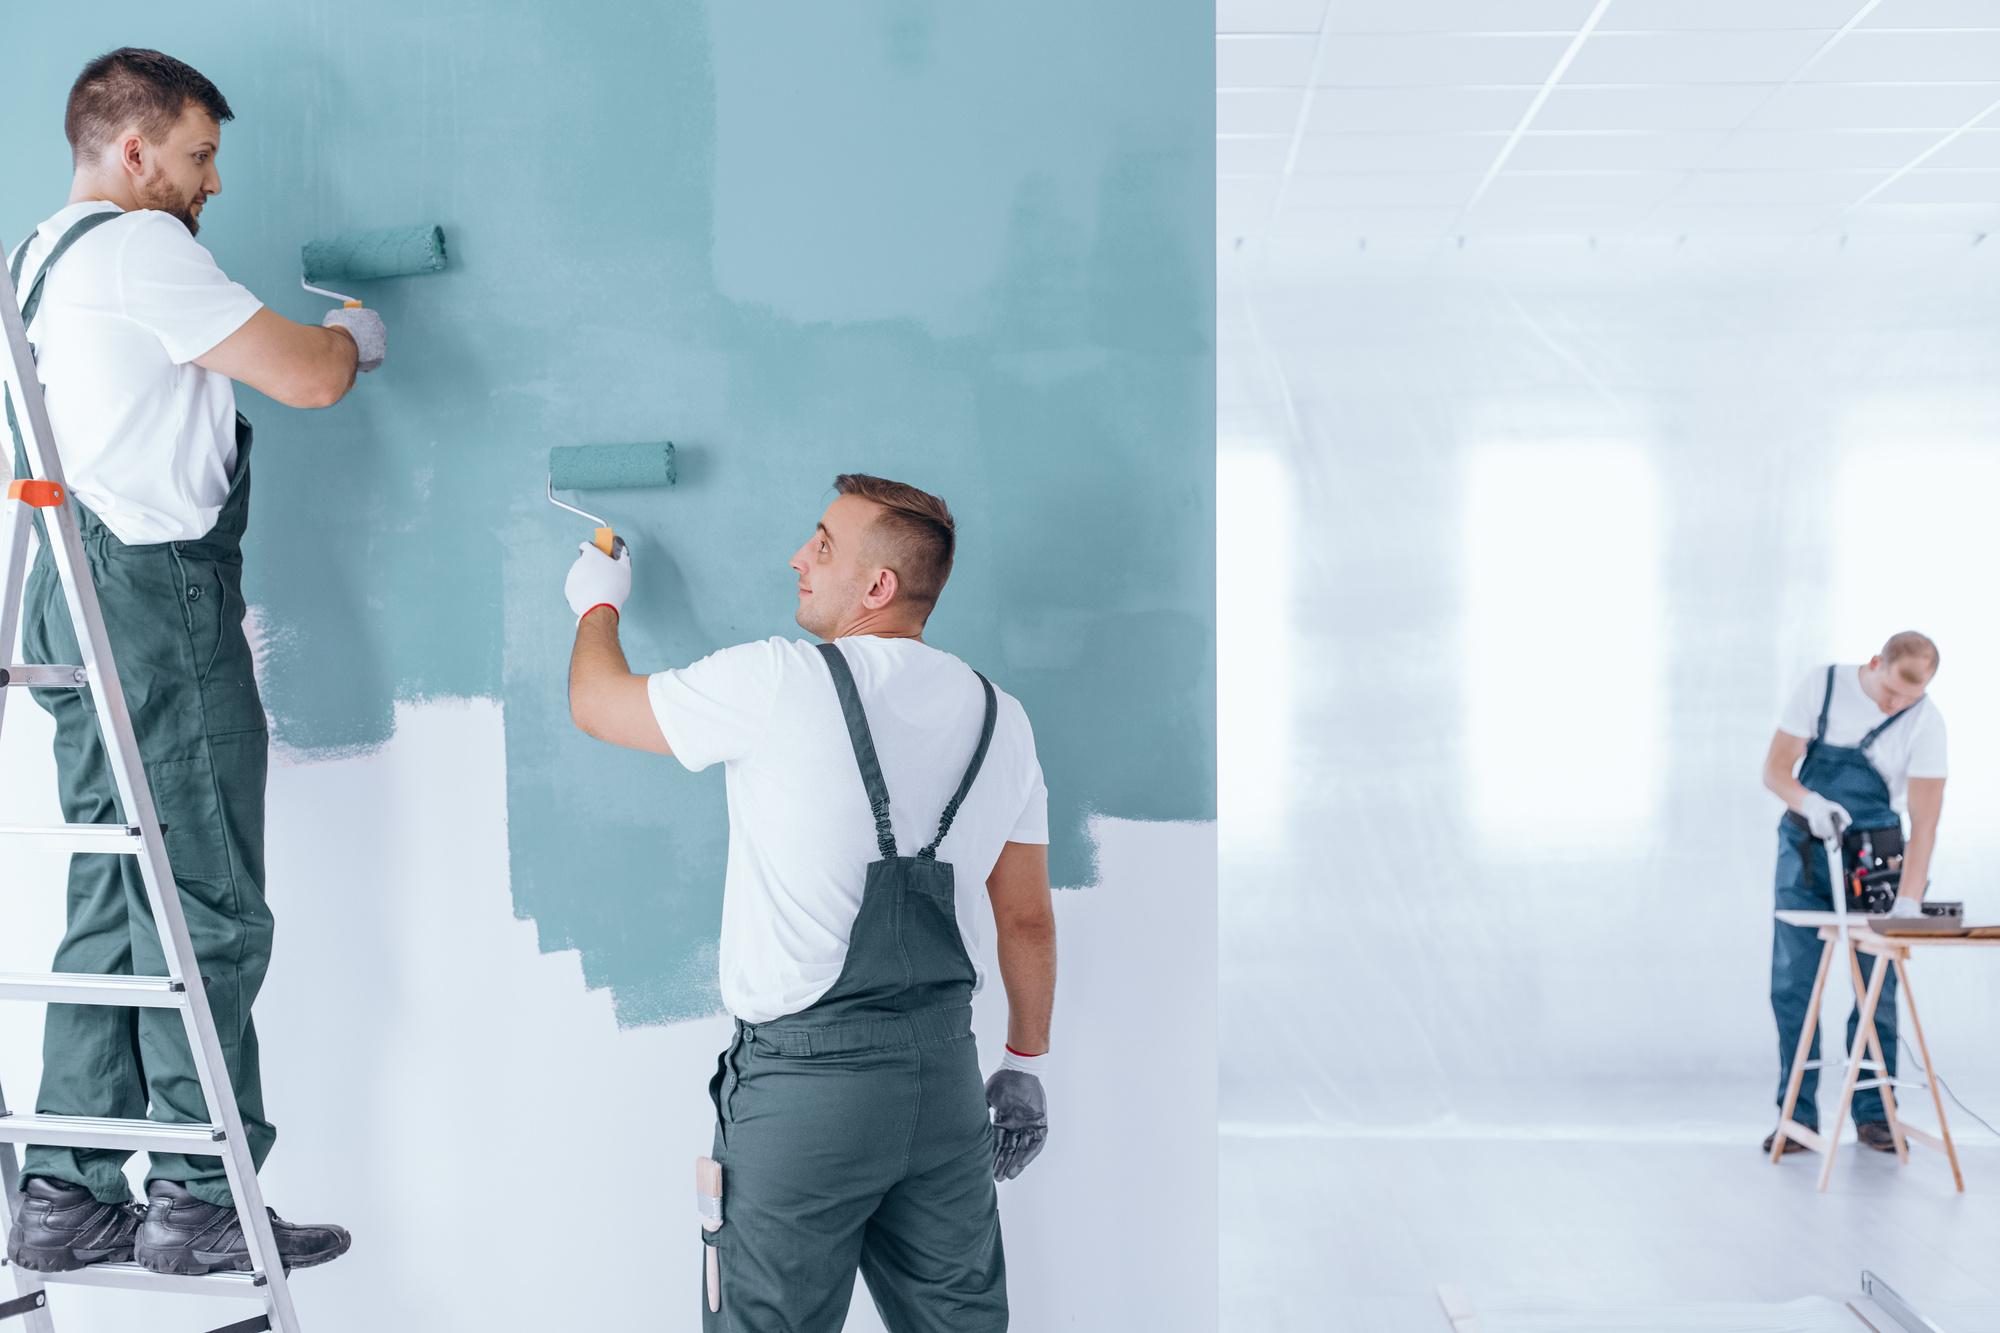 Men painting empty home interior